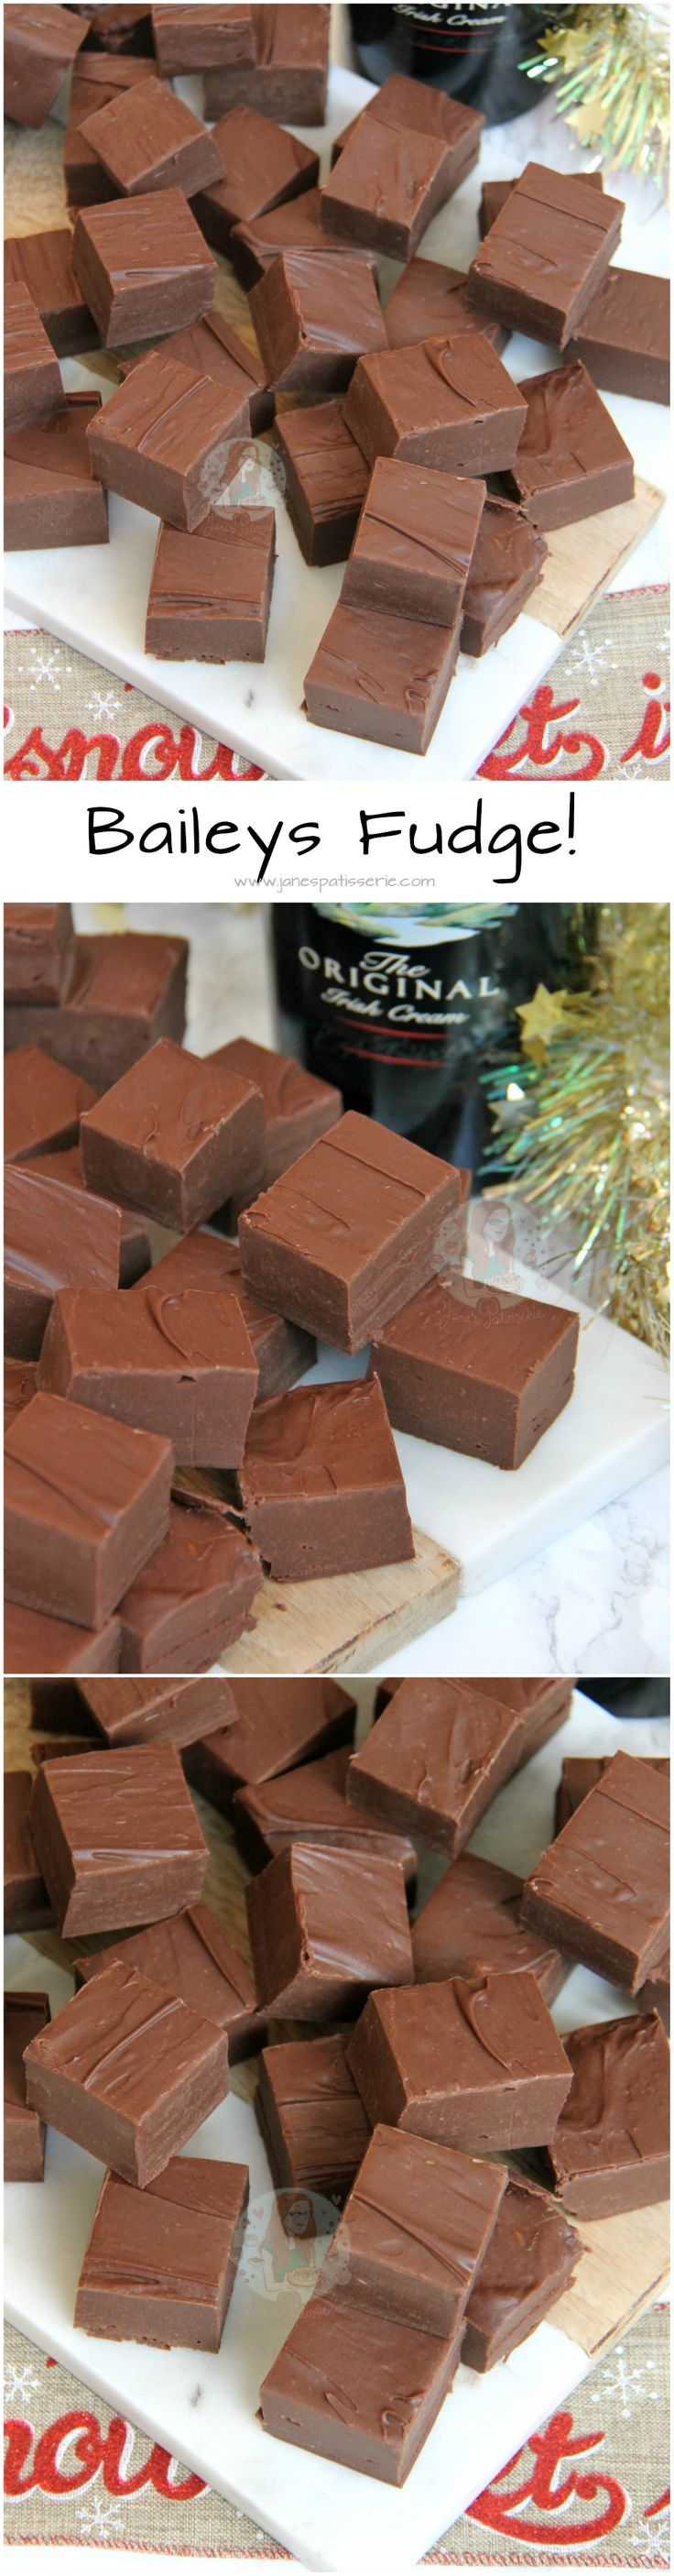 Baileys Fudge!! Easy Five Ingredient Baileys Fudge – perfect for Christmas!